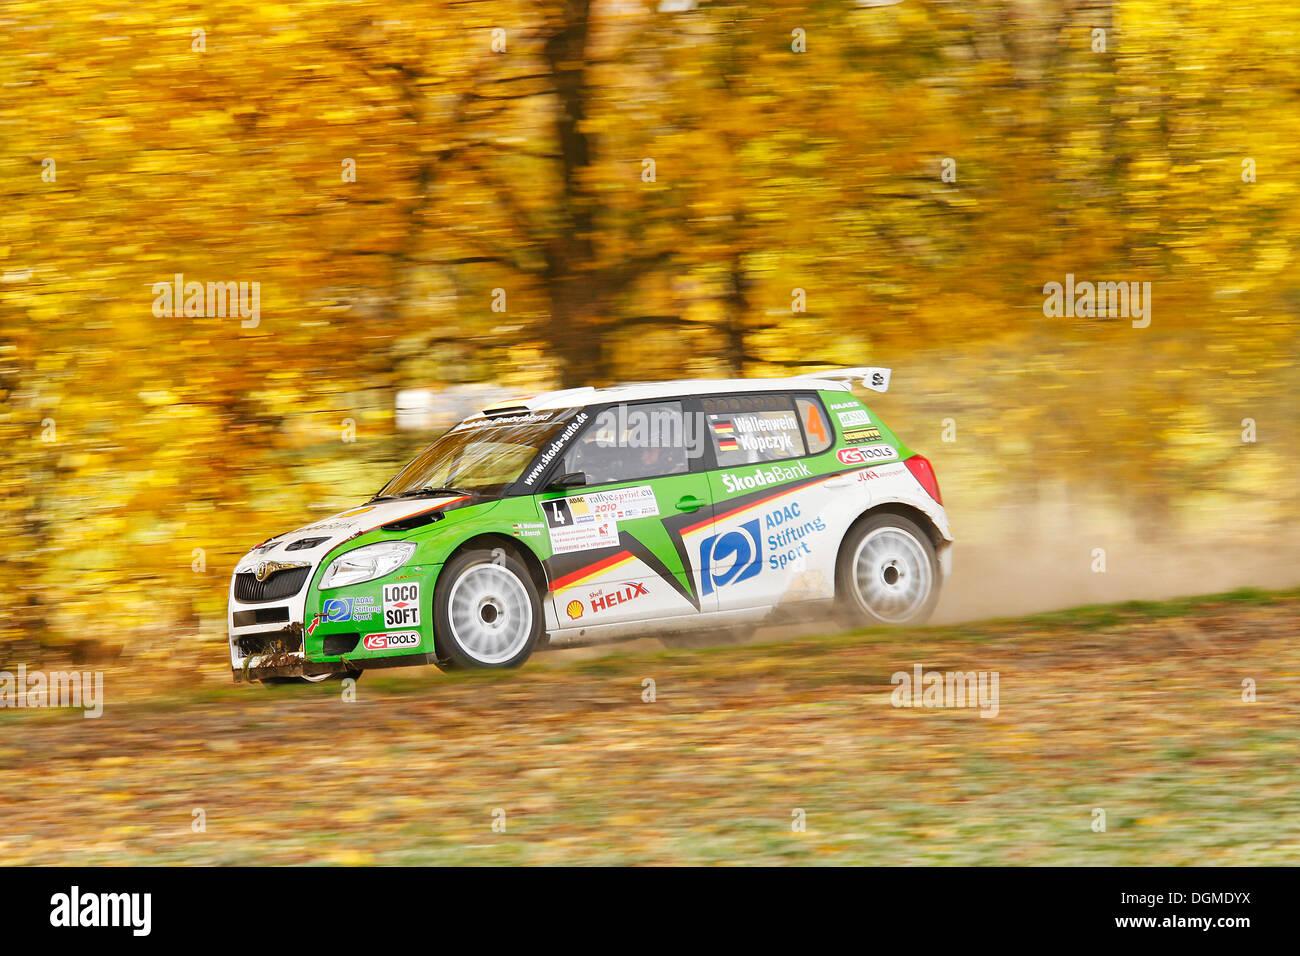 Skoda Fabia S2000, driven by Sandra Wallenwein, German Rally Vice Champion 2010, Rallye Stehr Rallyesprint 2010, Hesse - Stock Image